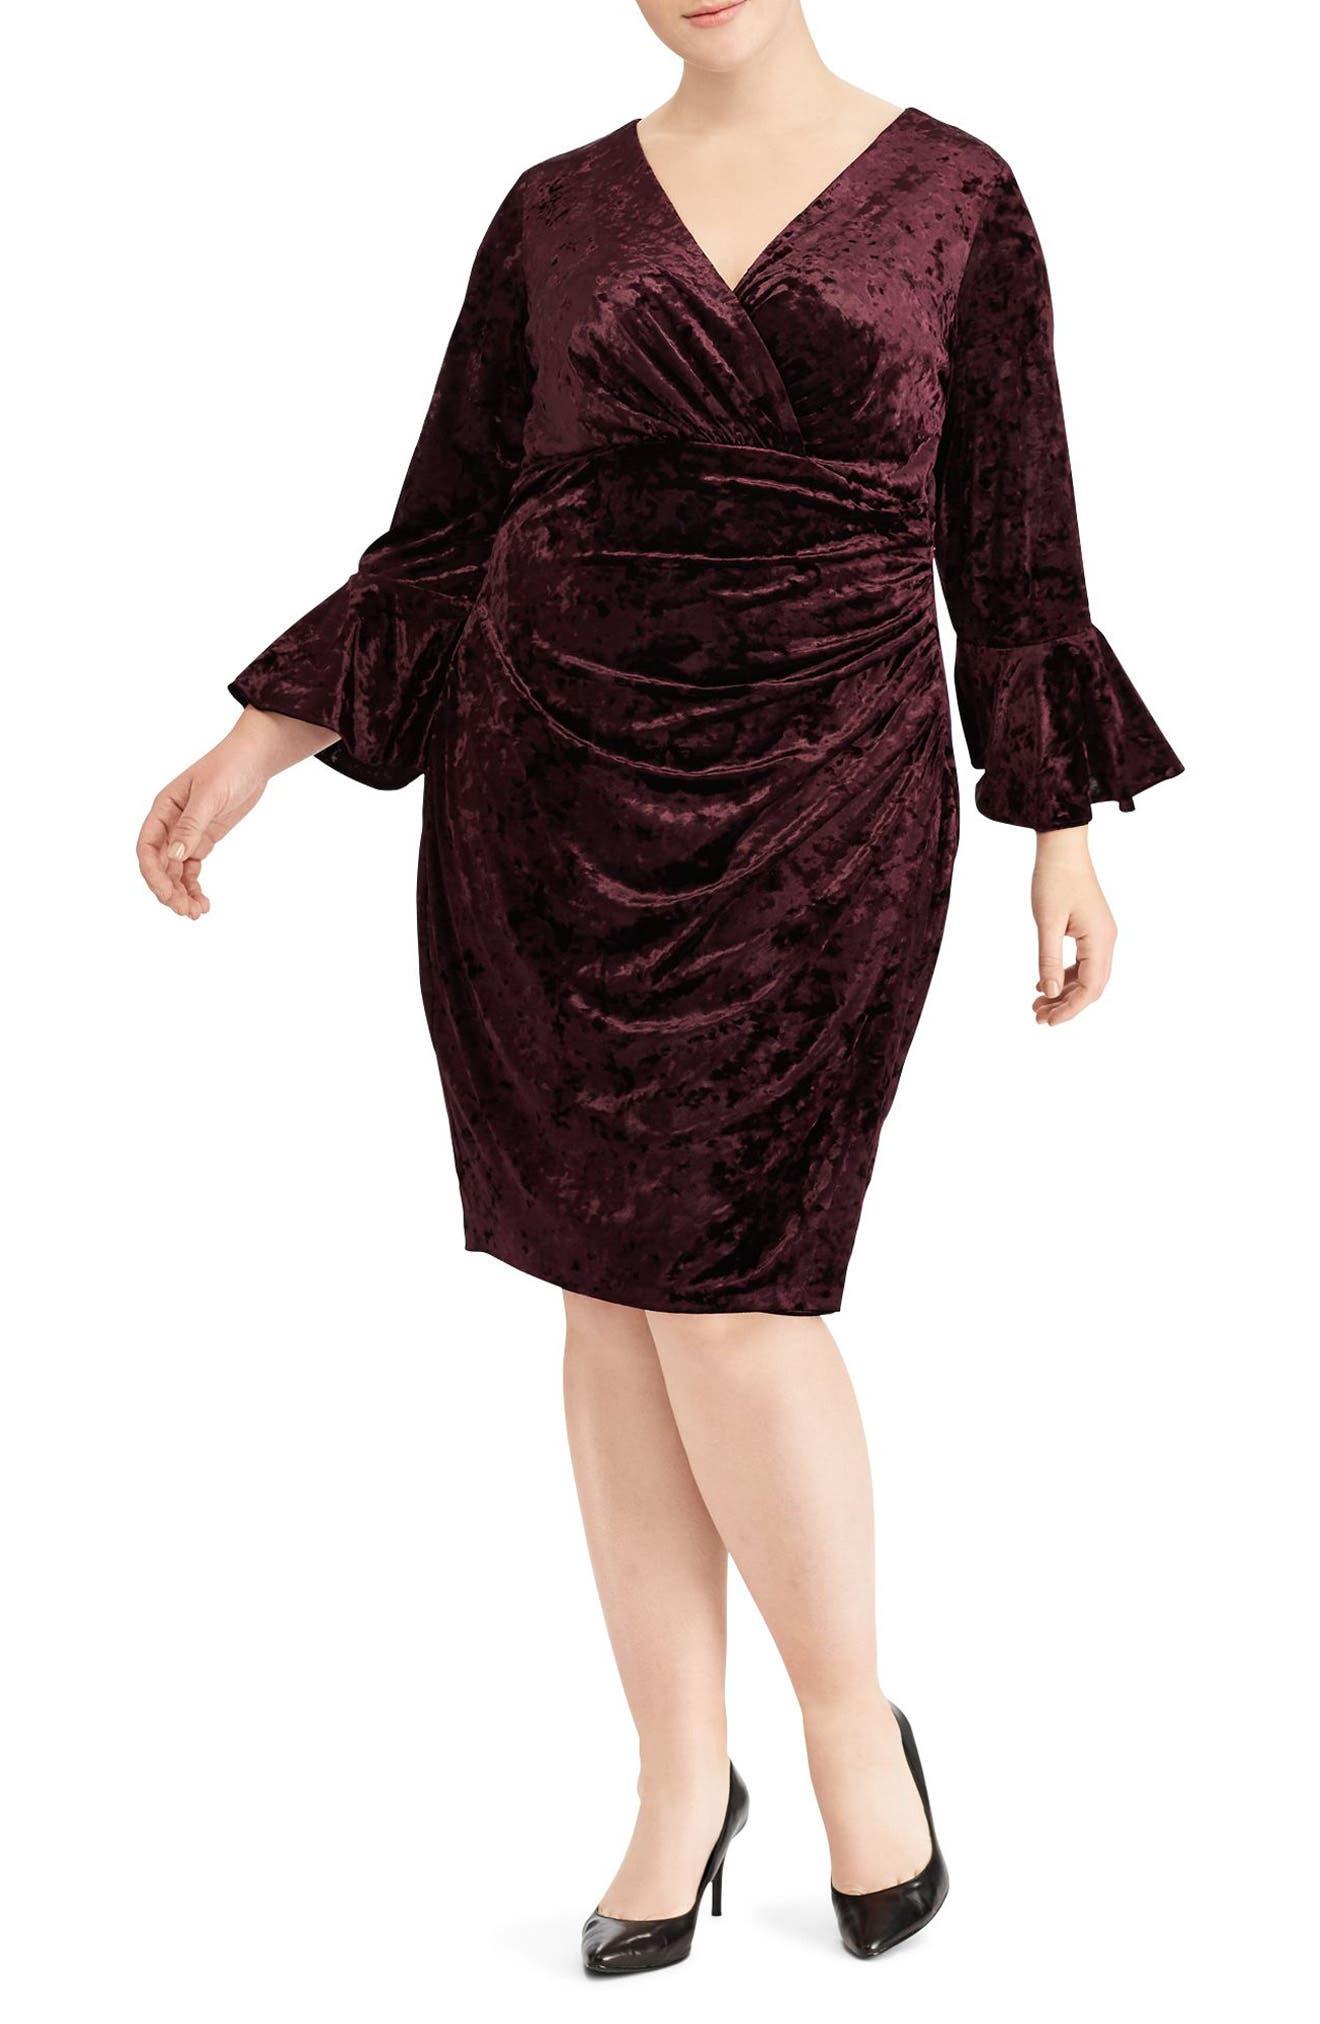 Main Image - Ralph Lauren Ruched Crushed Velvet Sheath Dress (Plus Size)